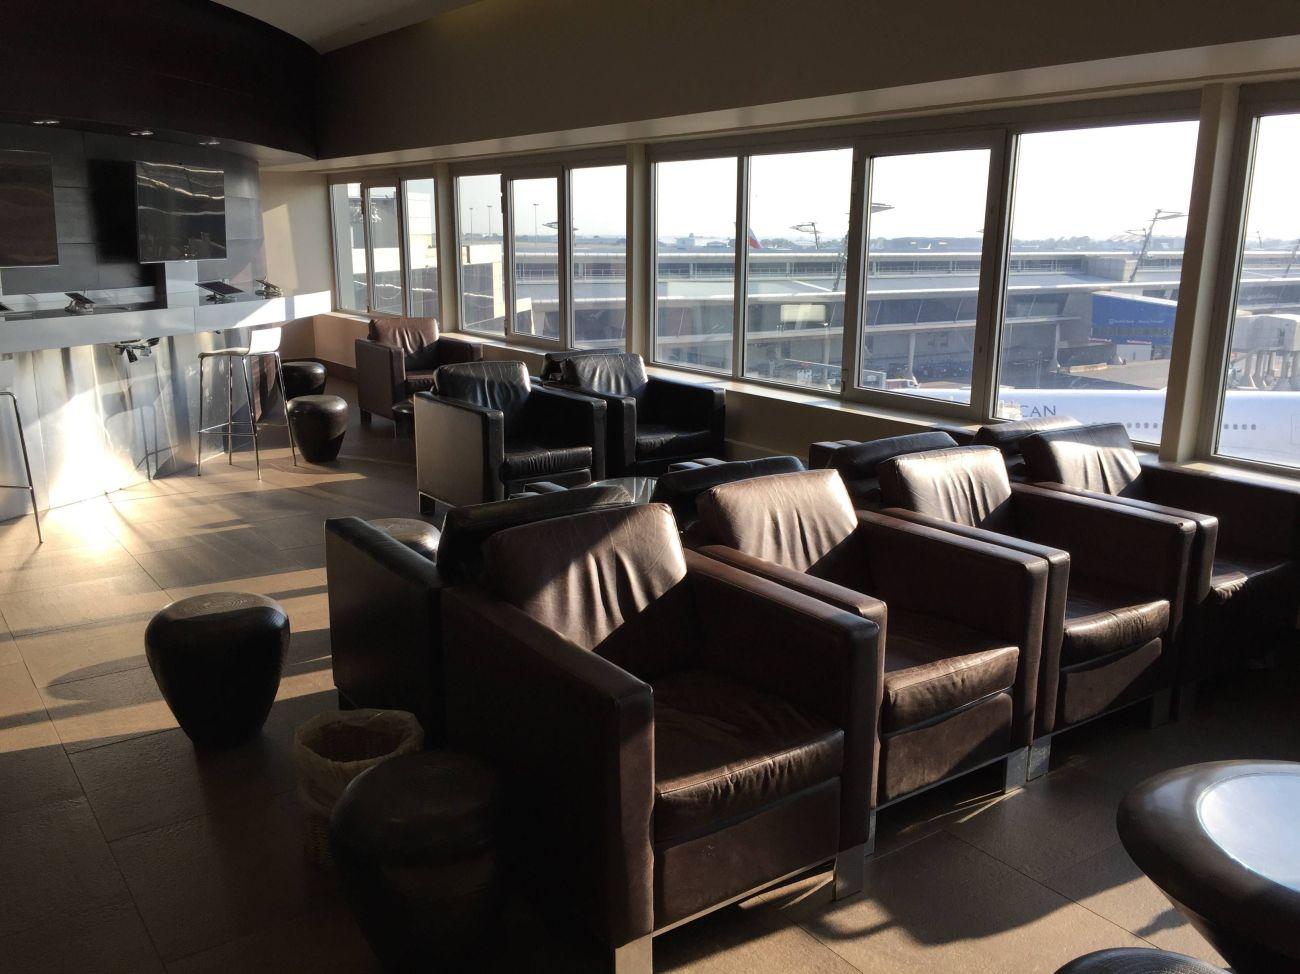 South African Platinum Lounge JNB PassageirodePrimeira-012